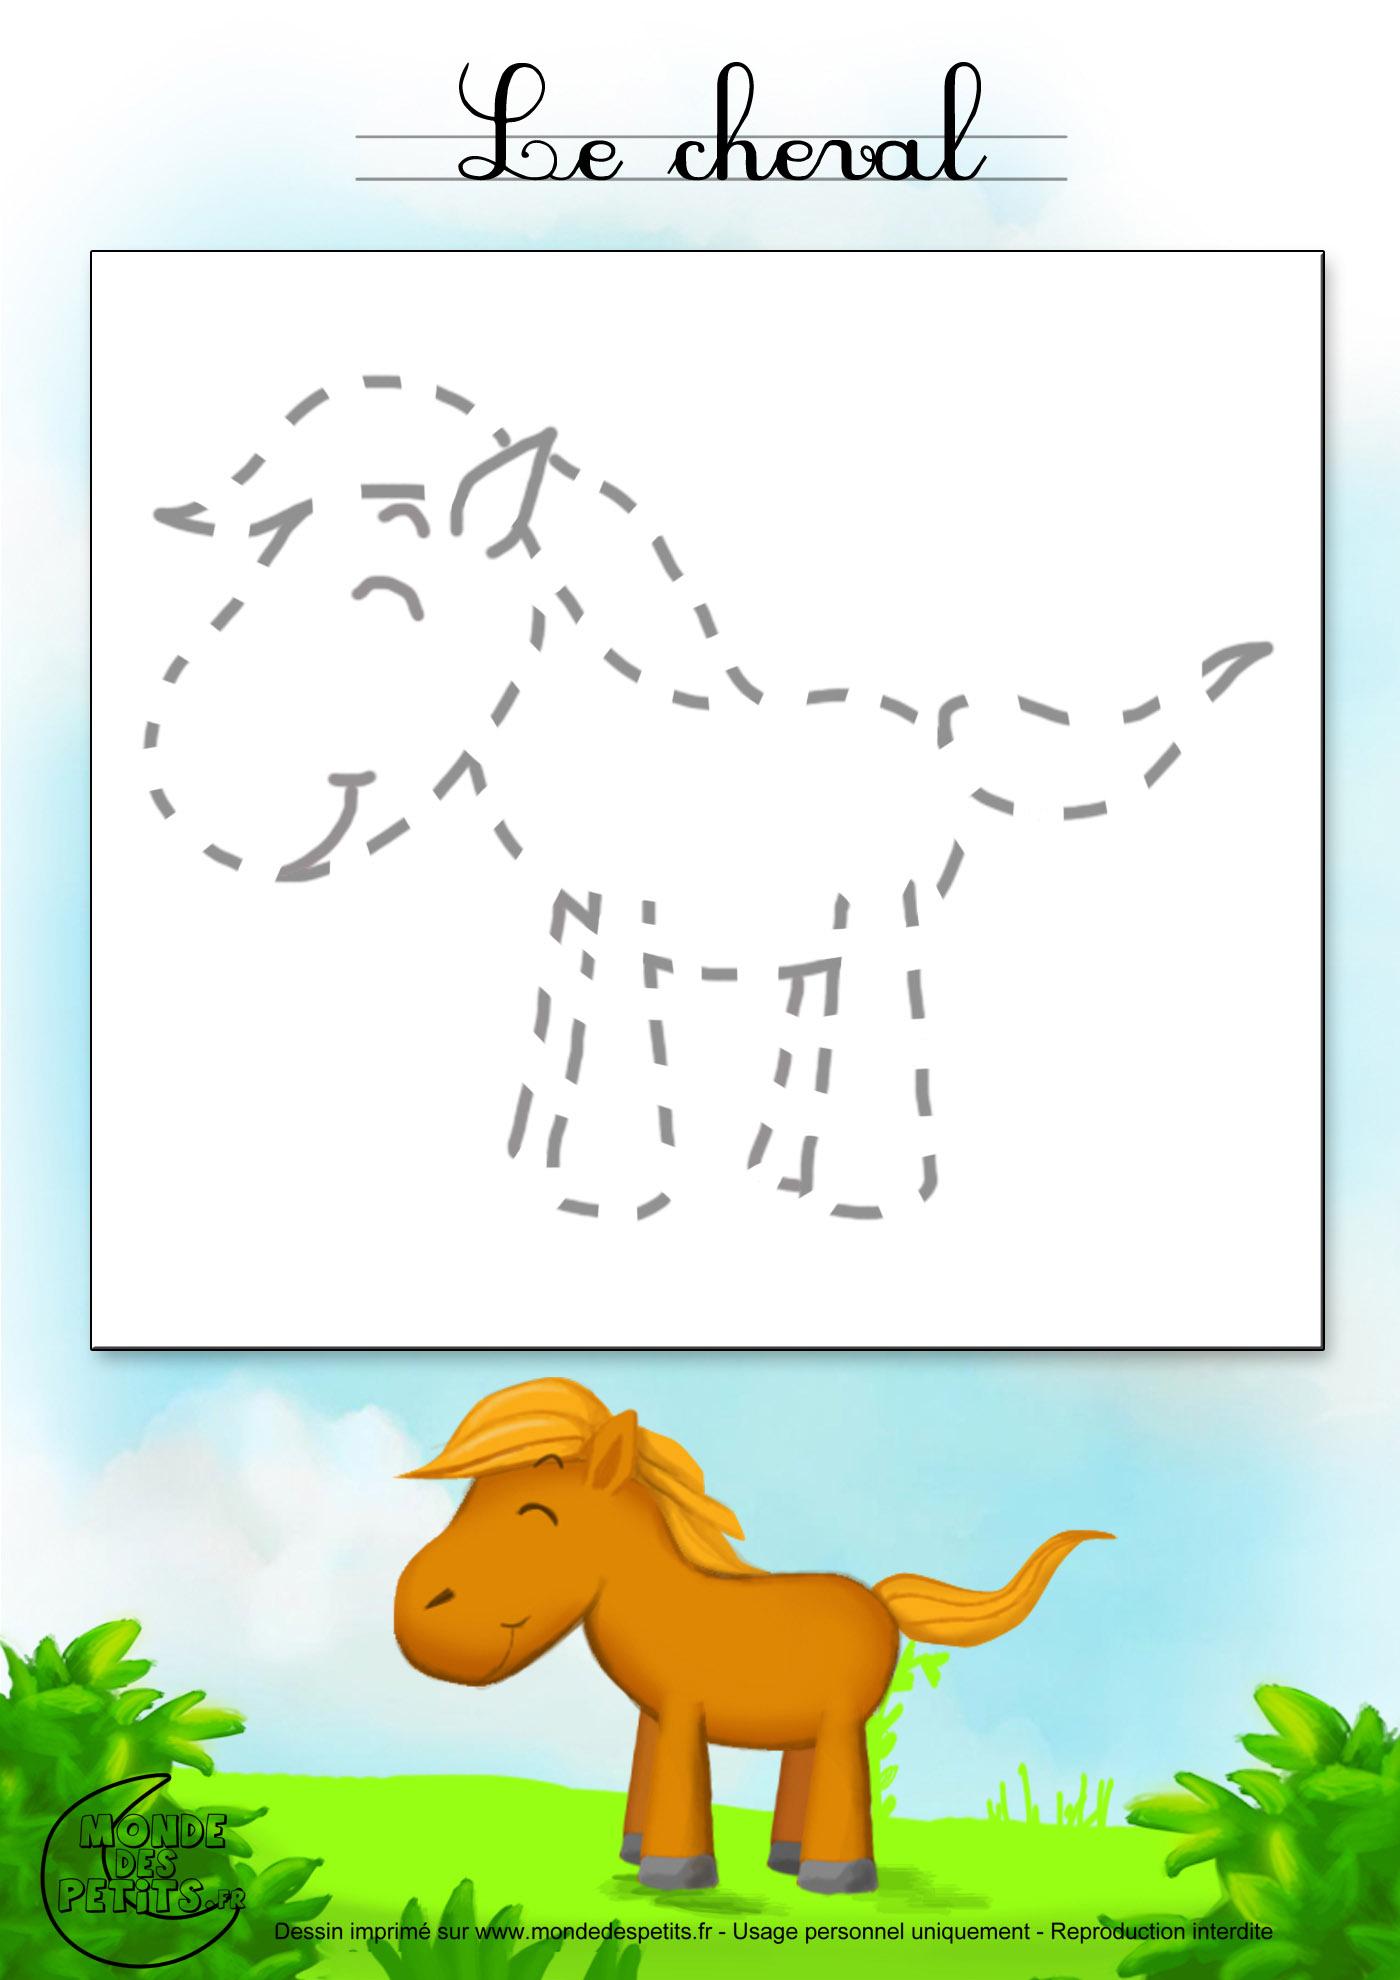 Monde des petits tutoriel vid o - Cheval a dessiner facile ...